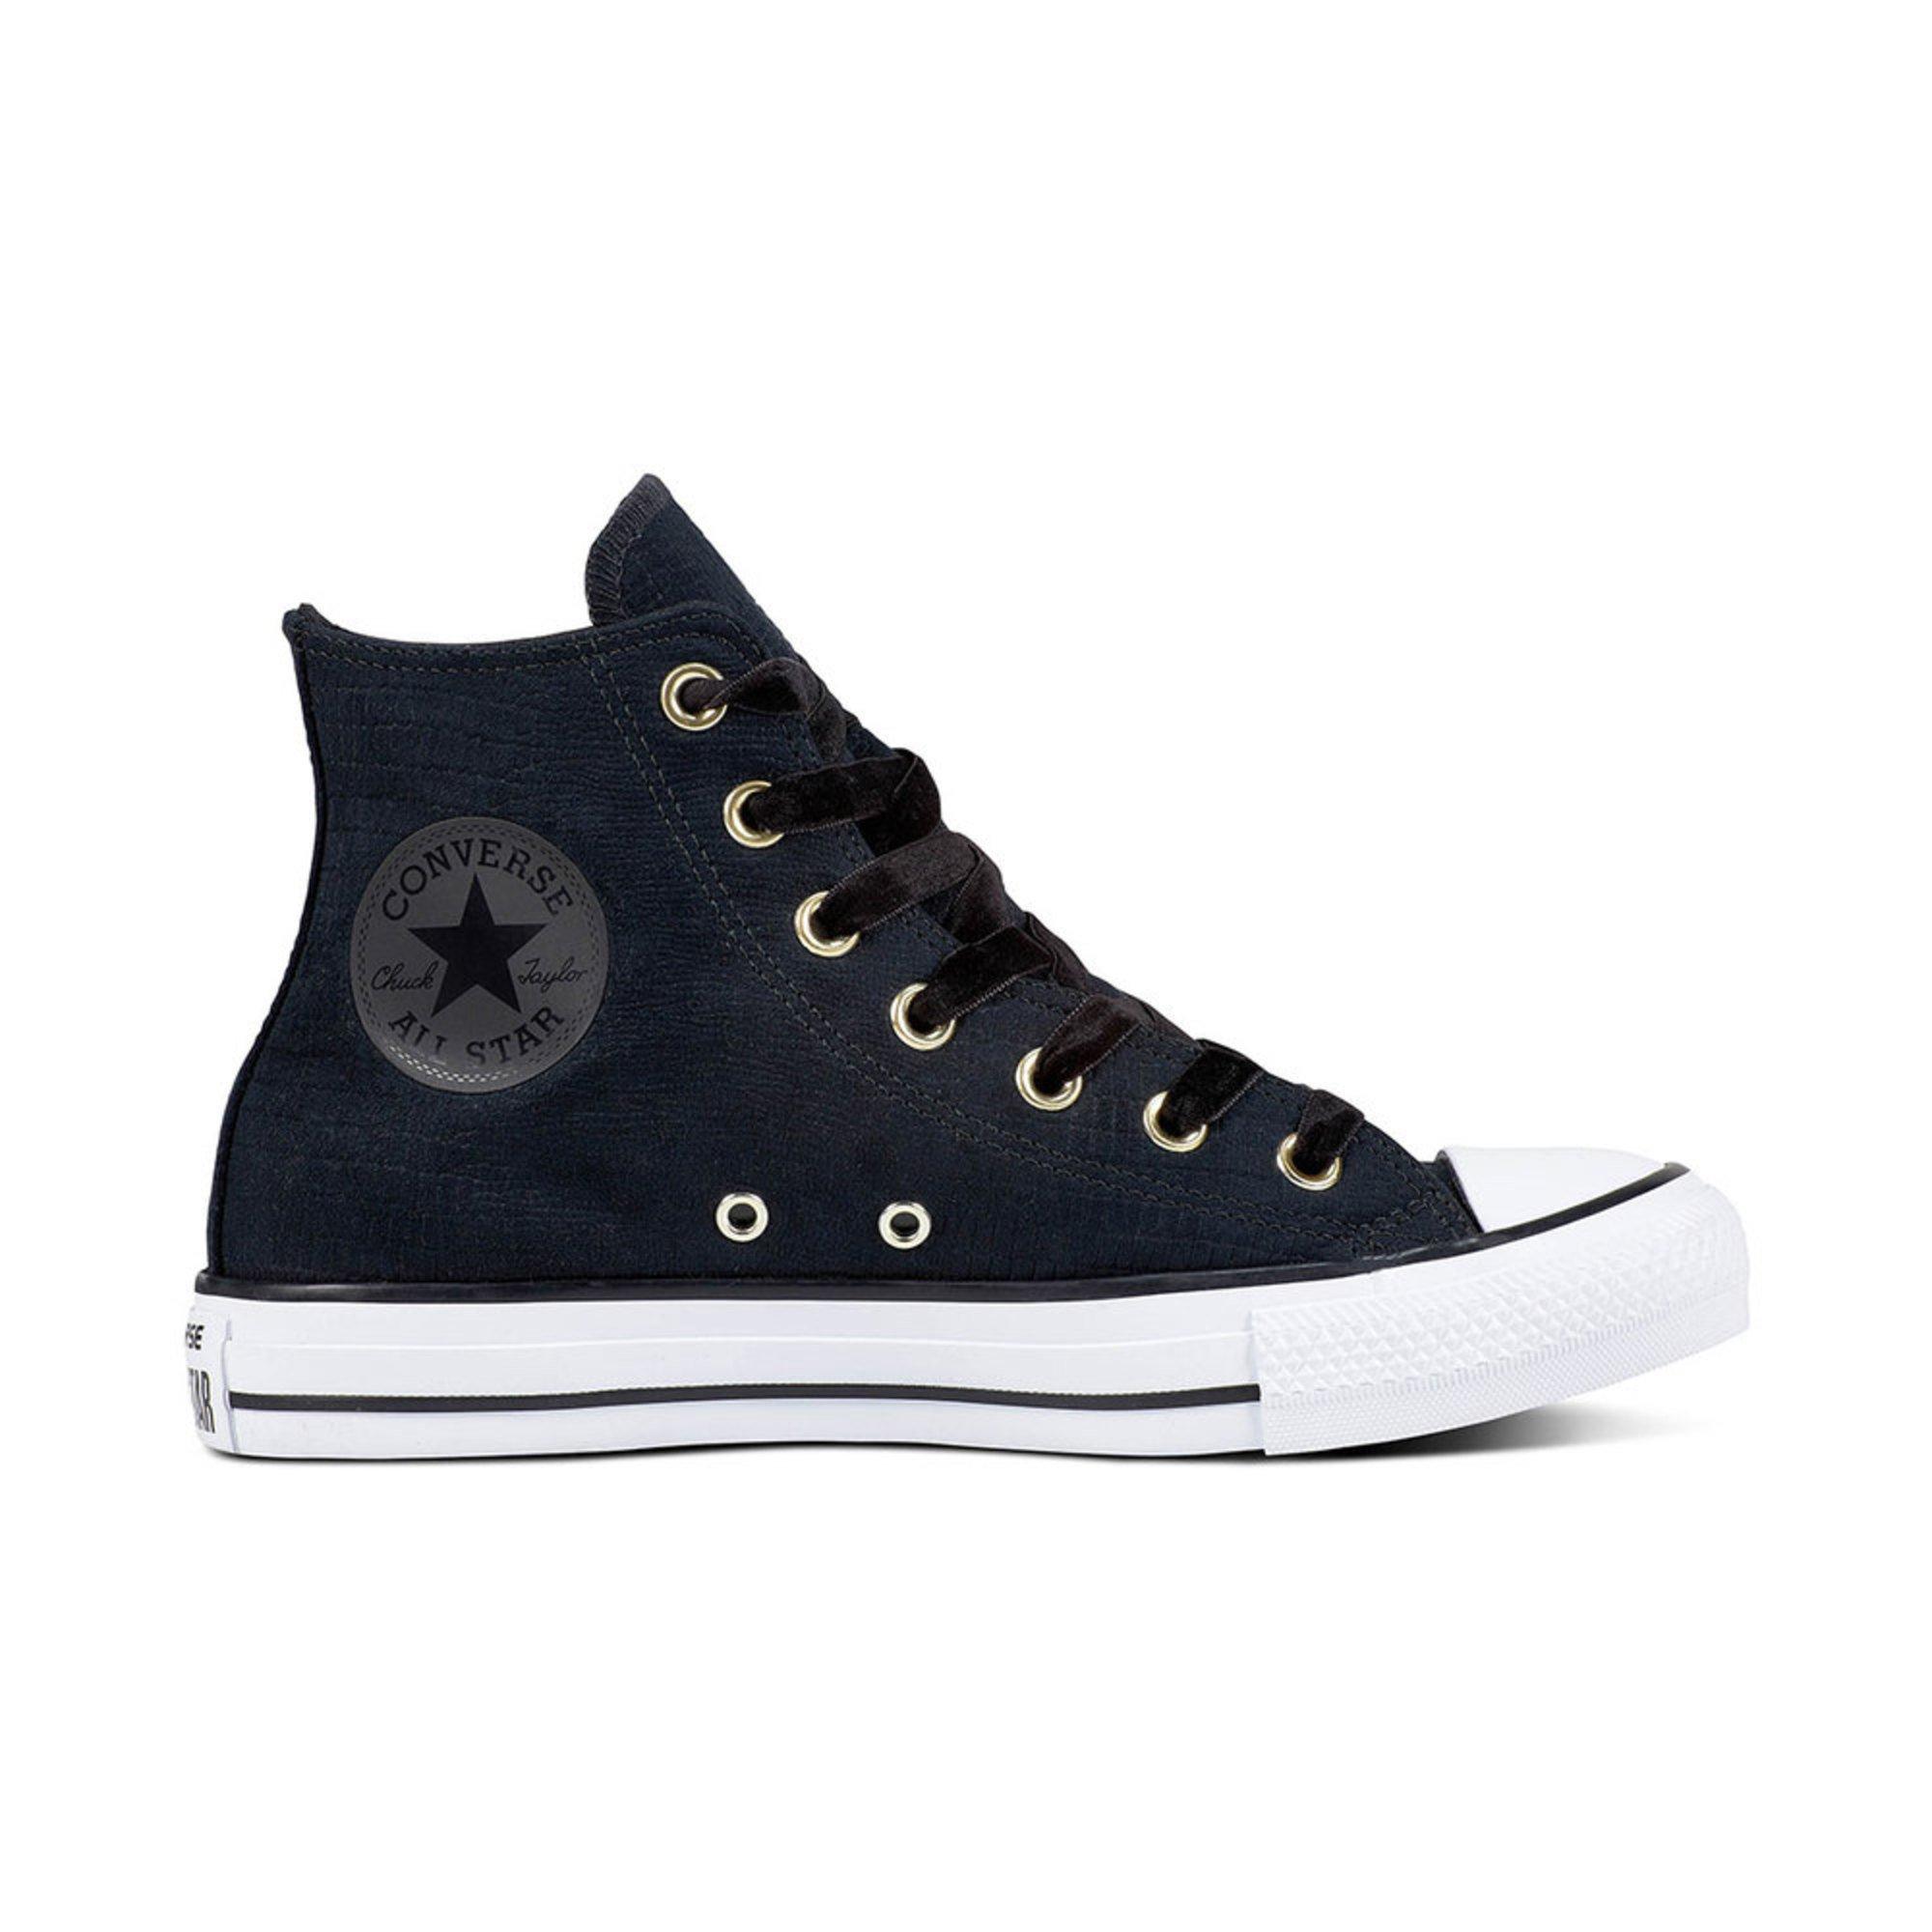 5c2dcf64d357 Converse. Converse Women s Chuck Taylor All Star Hi ...